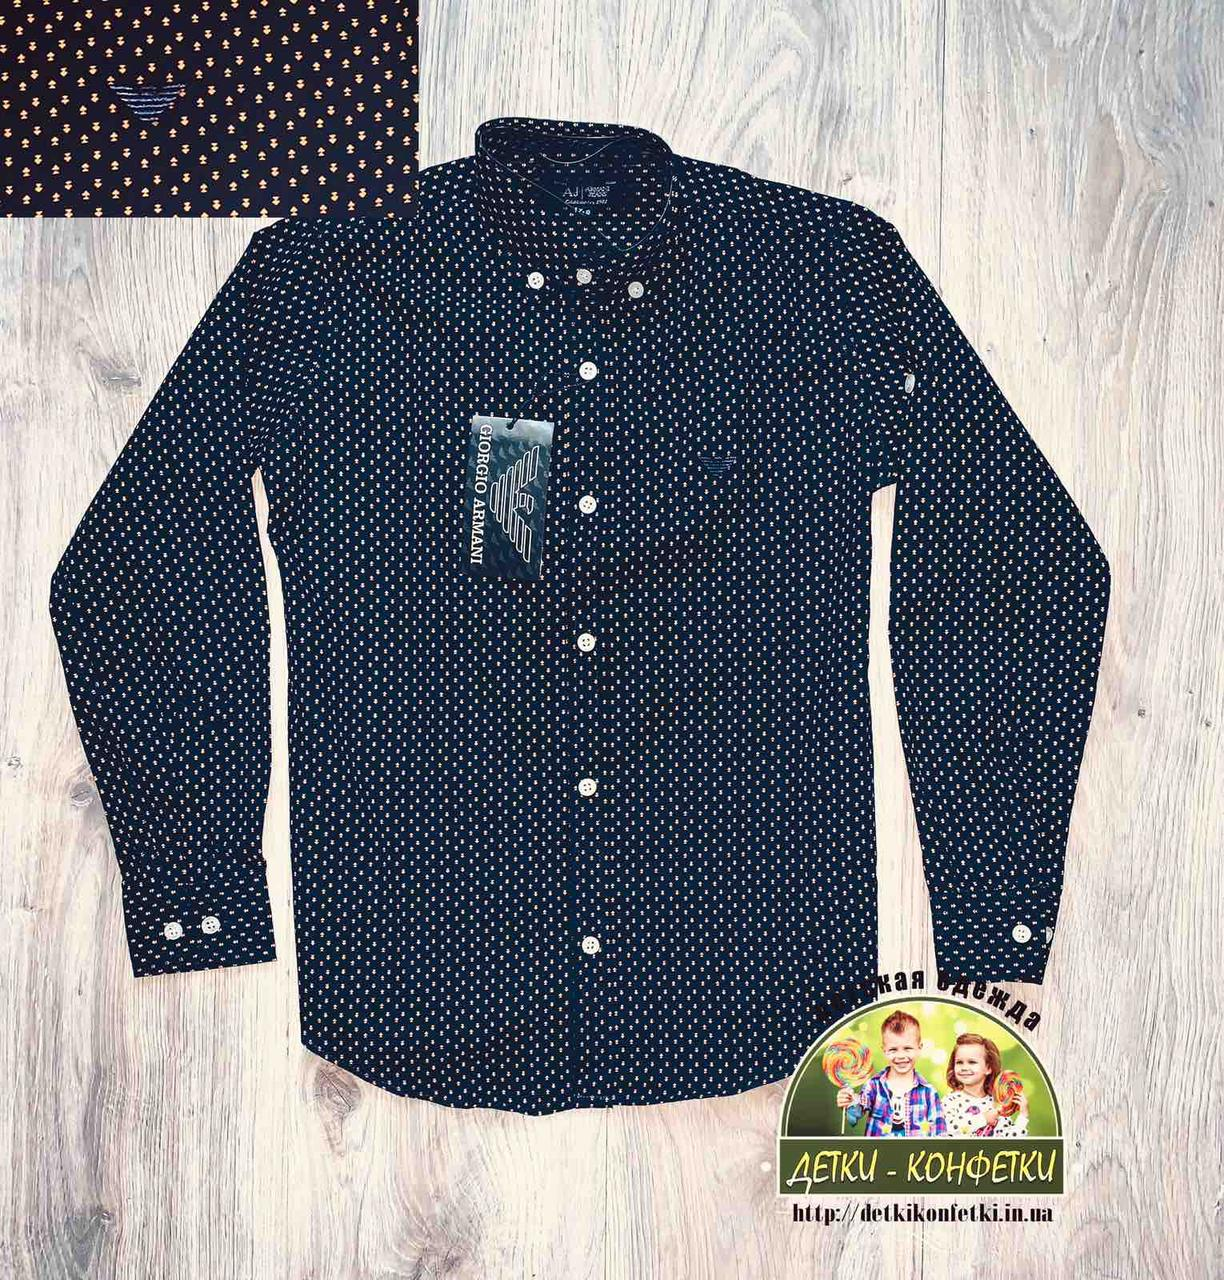 Рубашка темно-синяя ARMANI на мальчика 7-8 лет